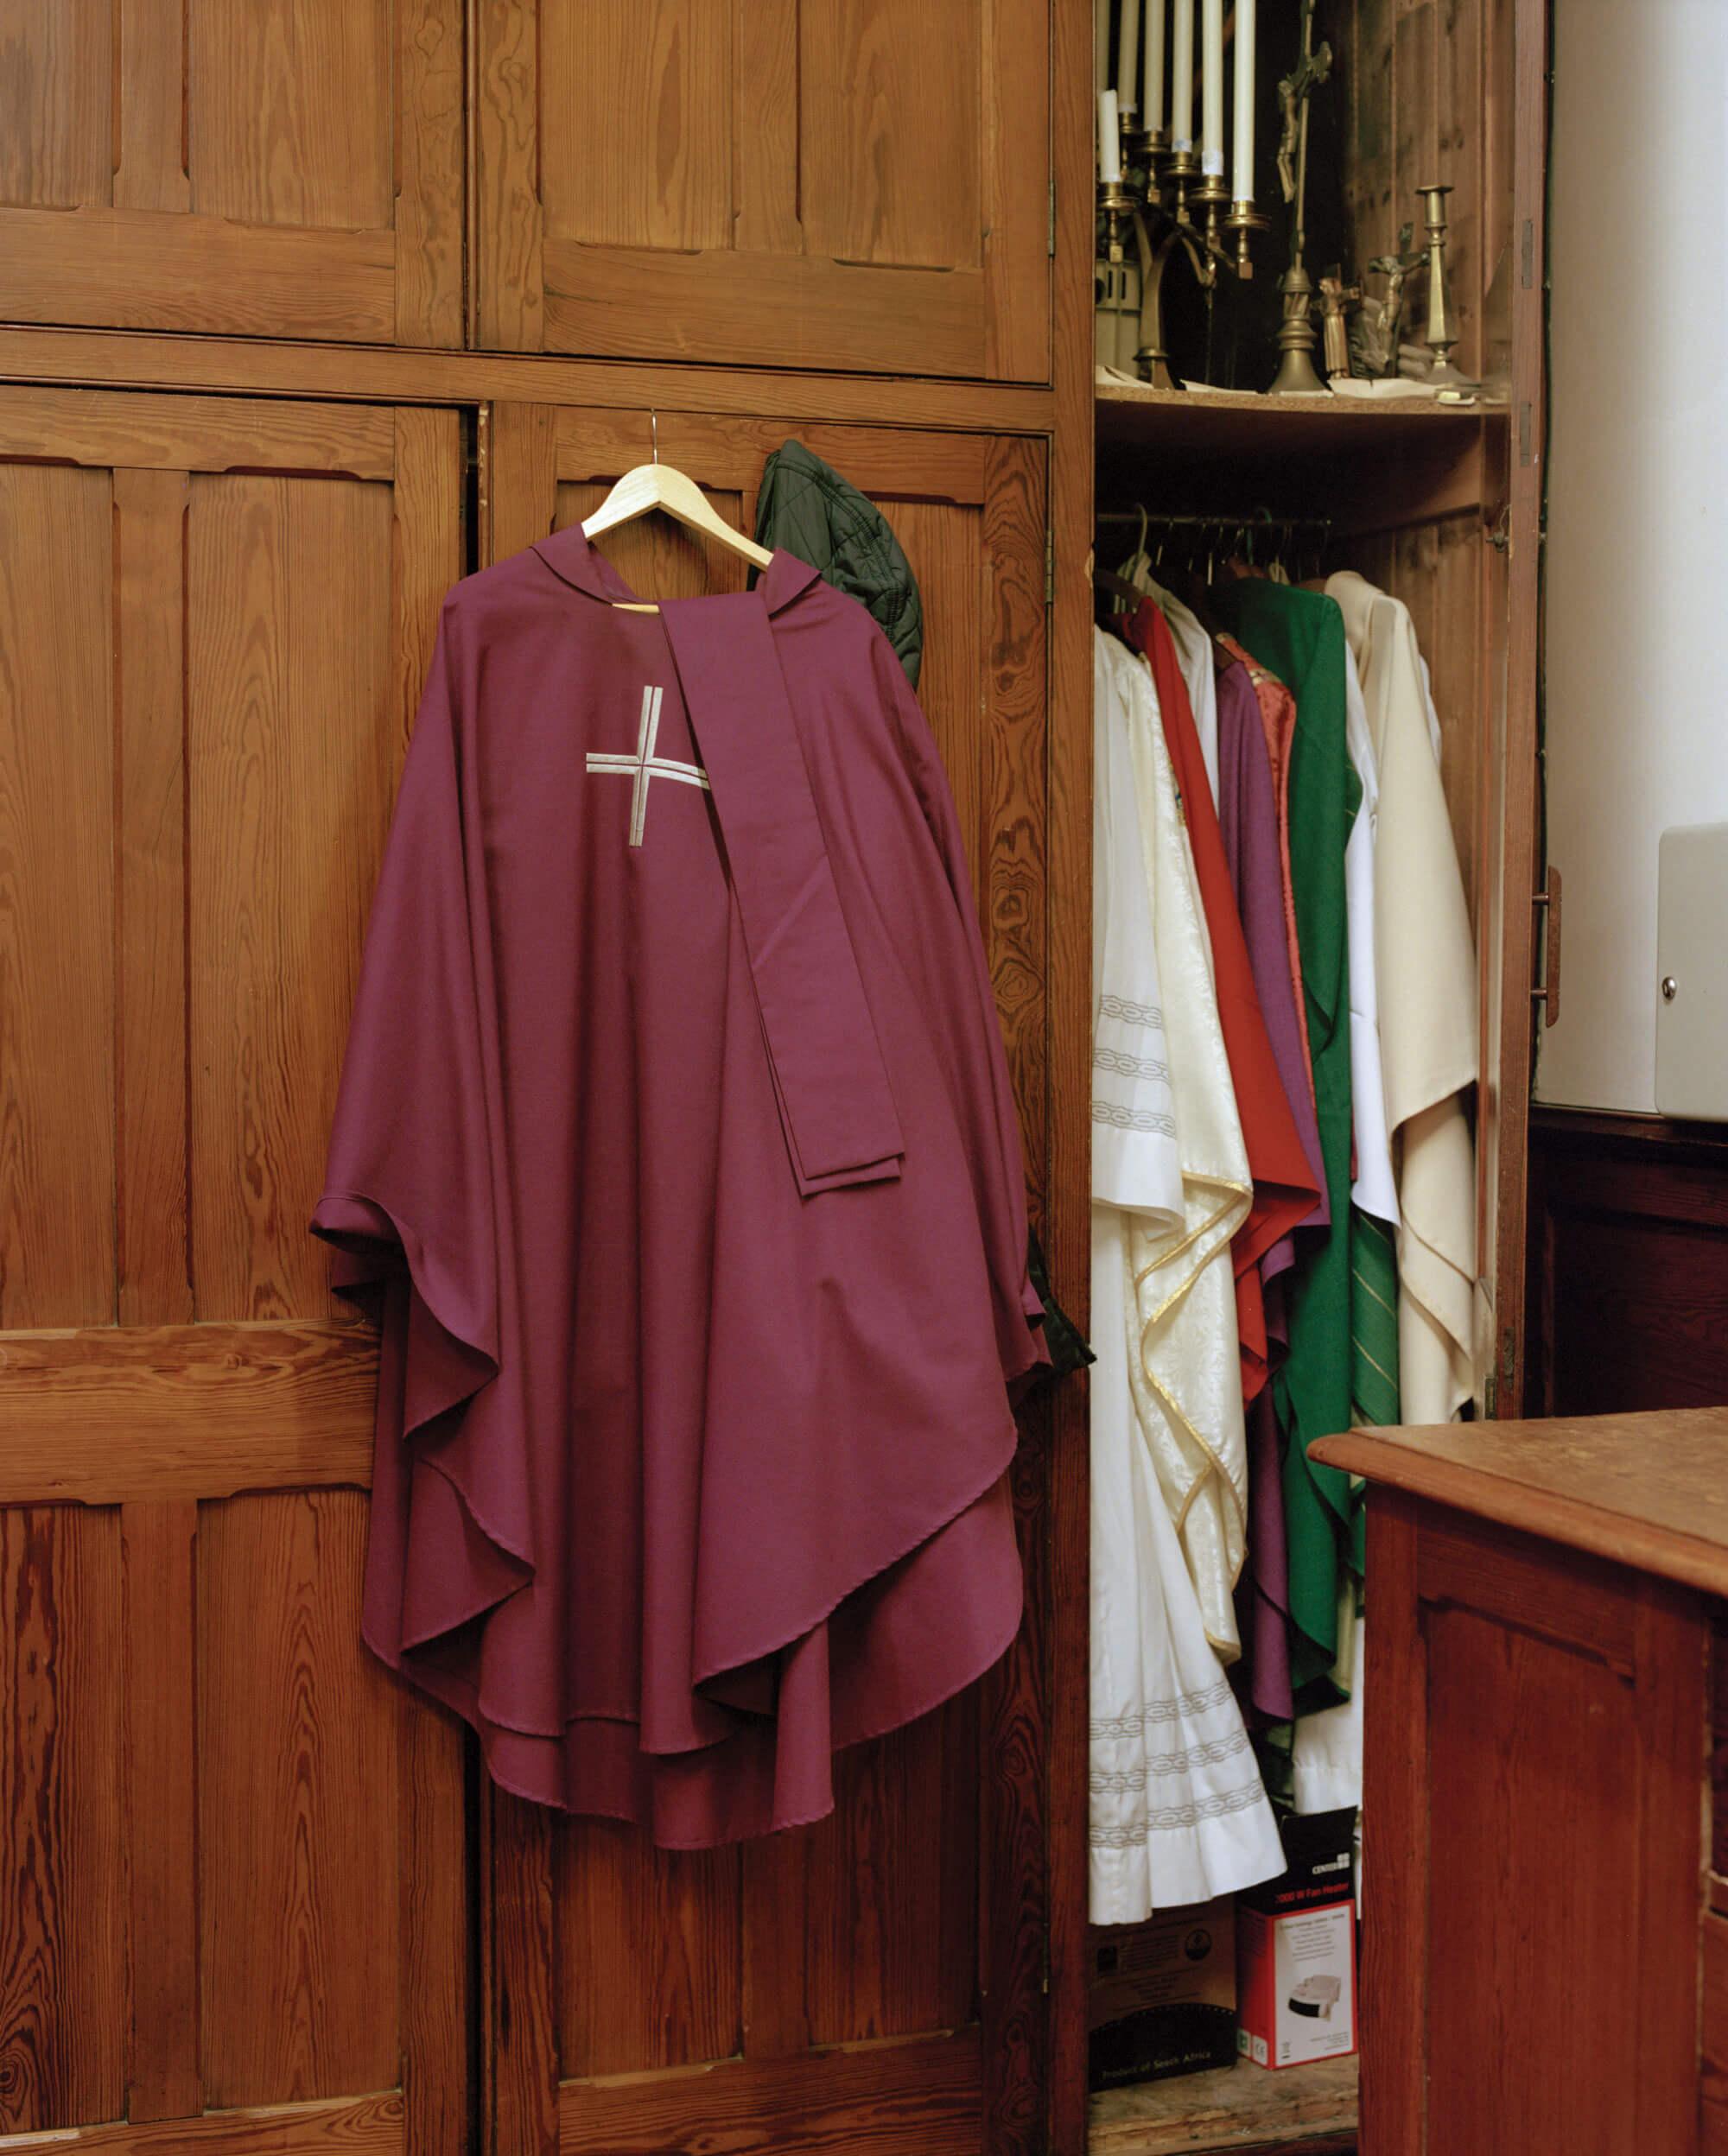 catholic robes in the church by matt Scott against wardrobe